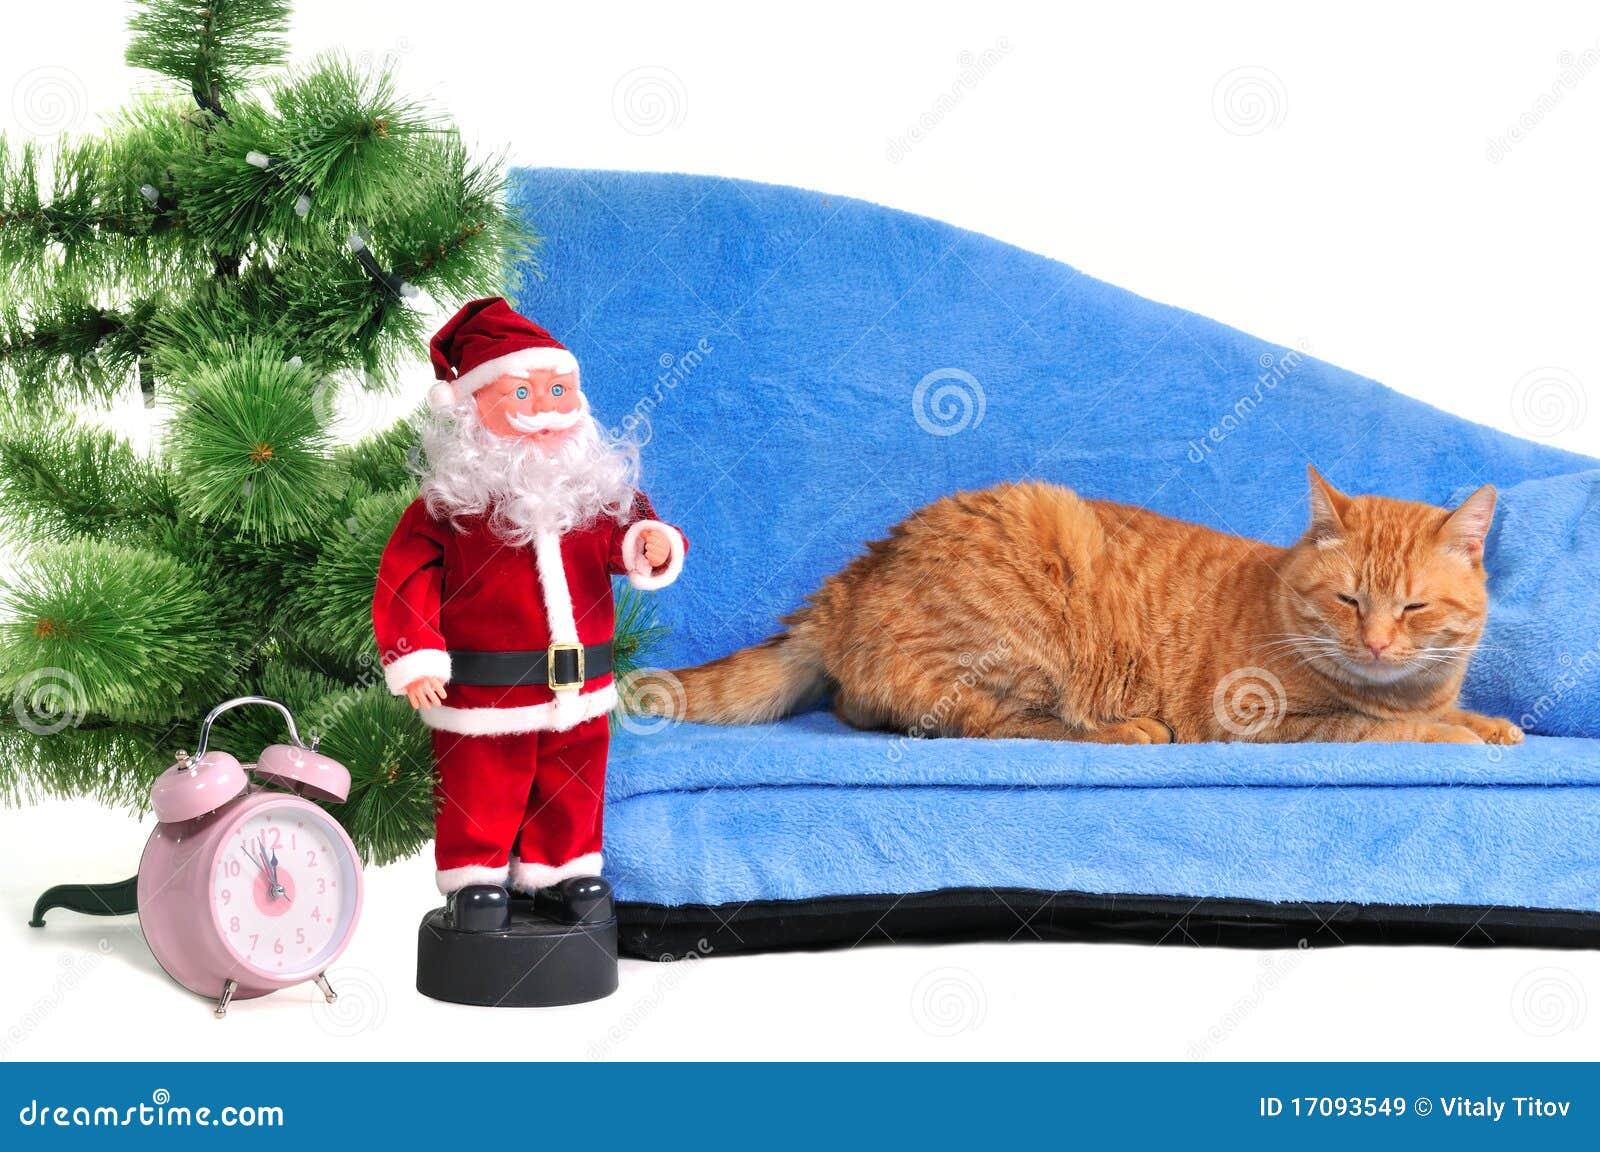 Cat on a Christmas Sofa